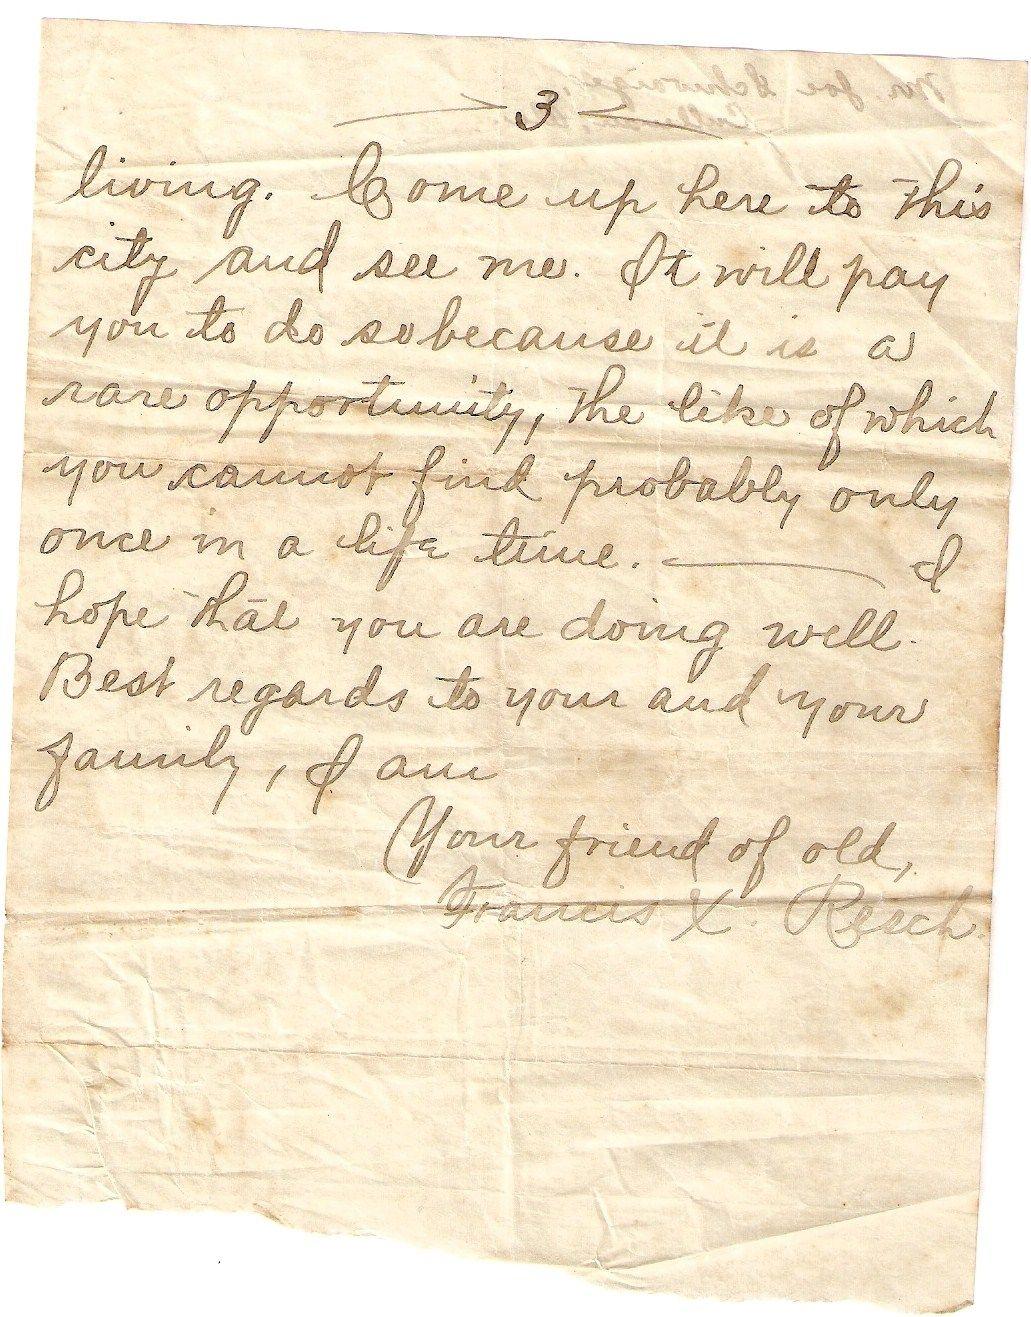 Courtship letter